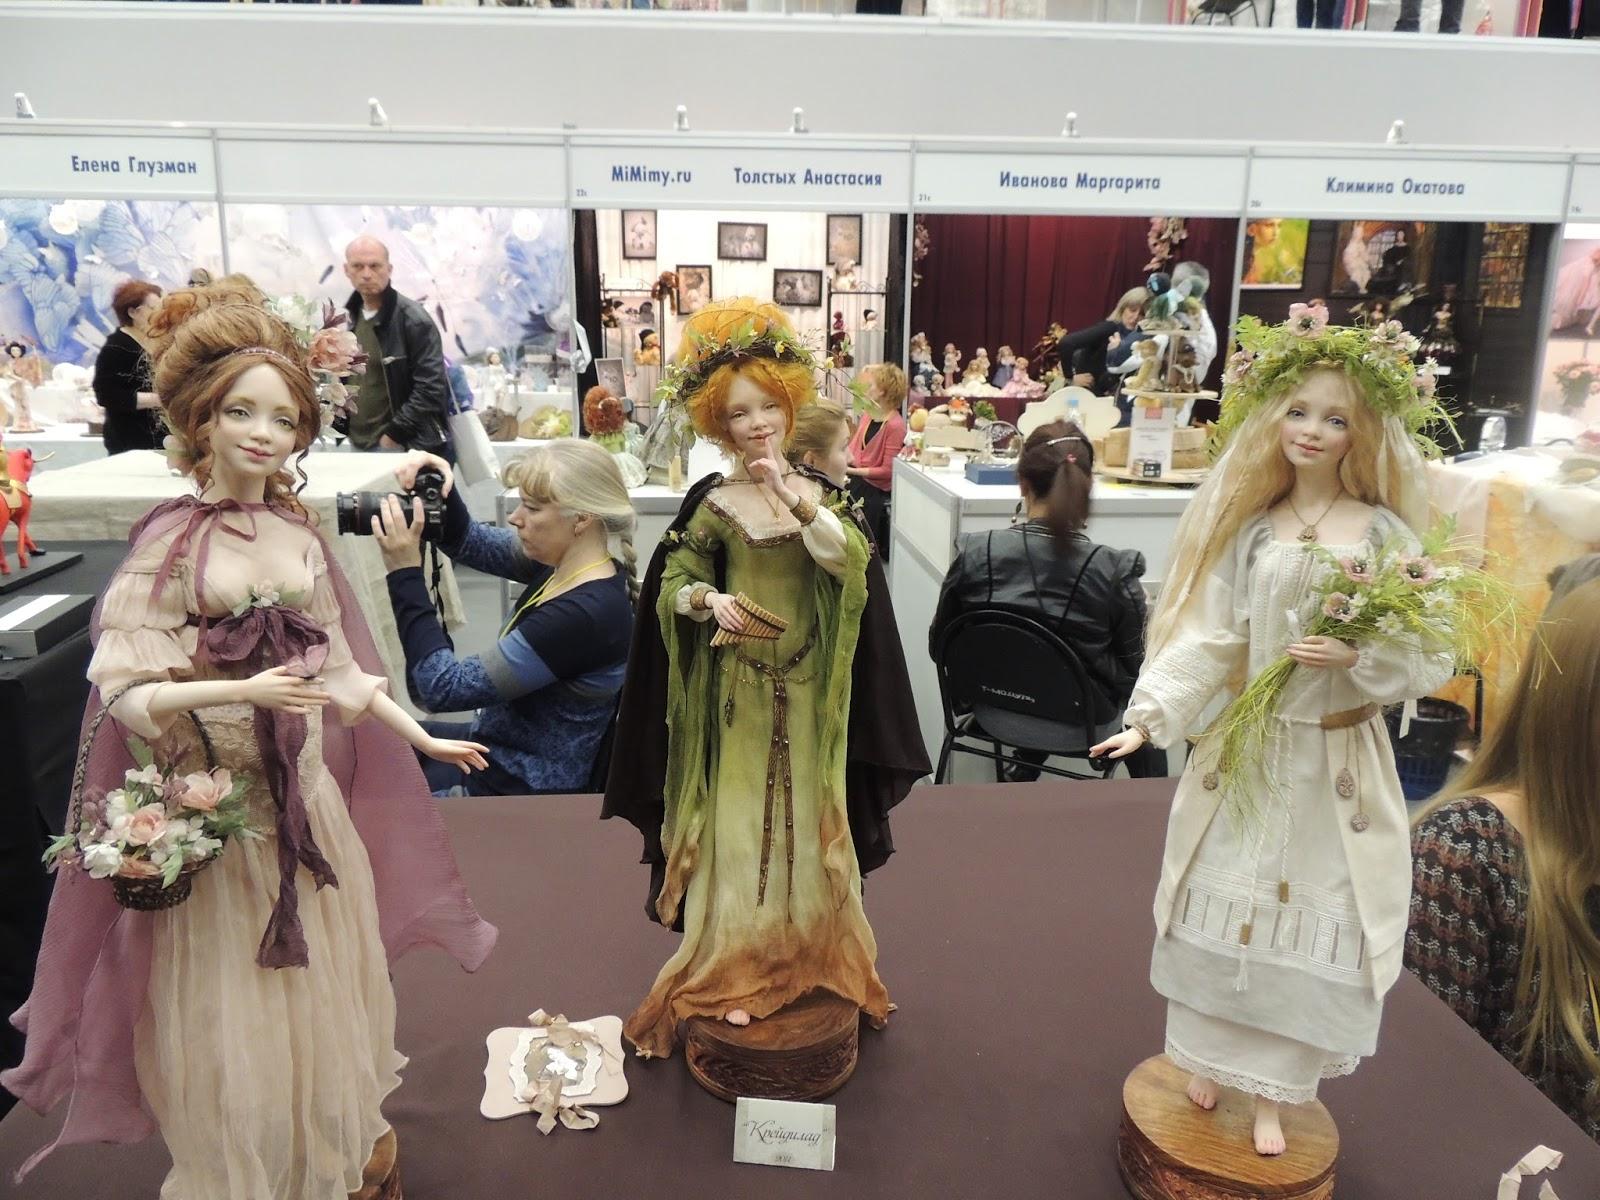 куклы,выставка,тишинка,салон,москва,фея,девушка